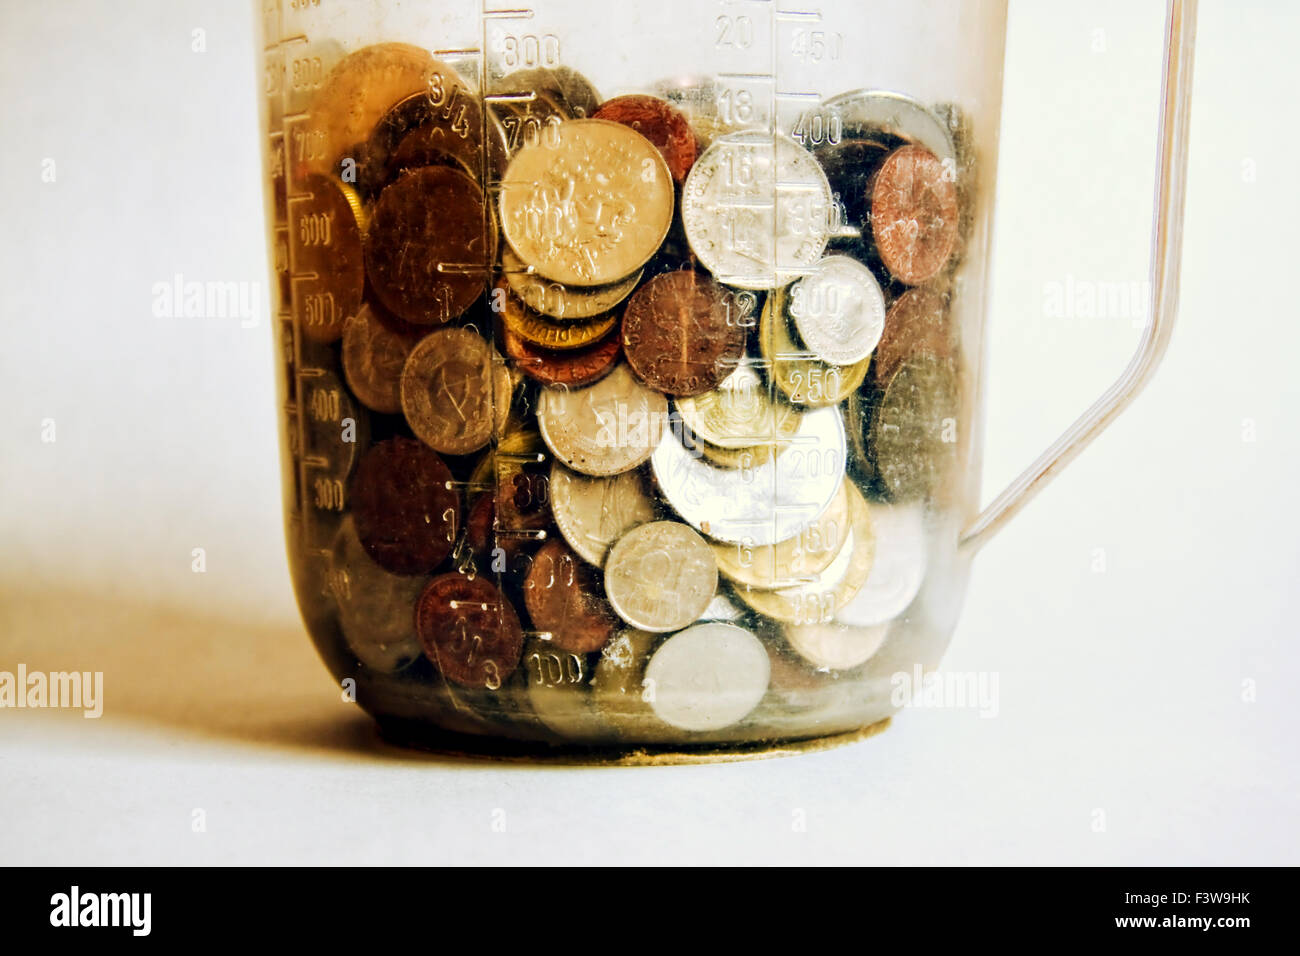 money, cash, hard cash - Stock Image